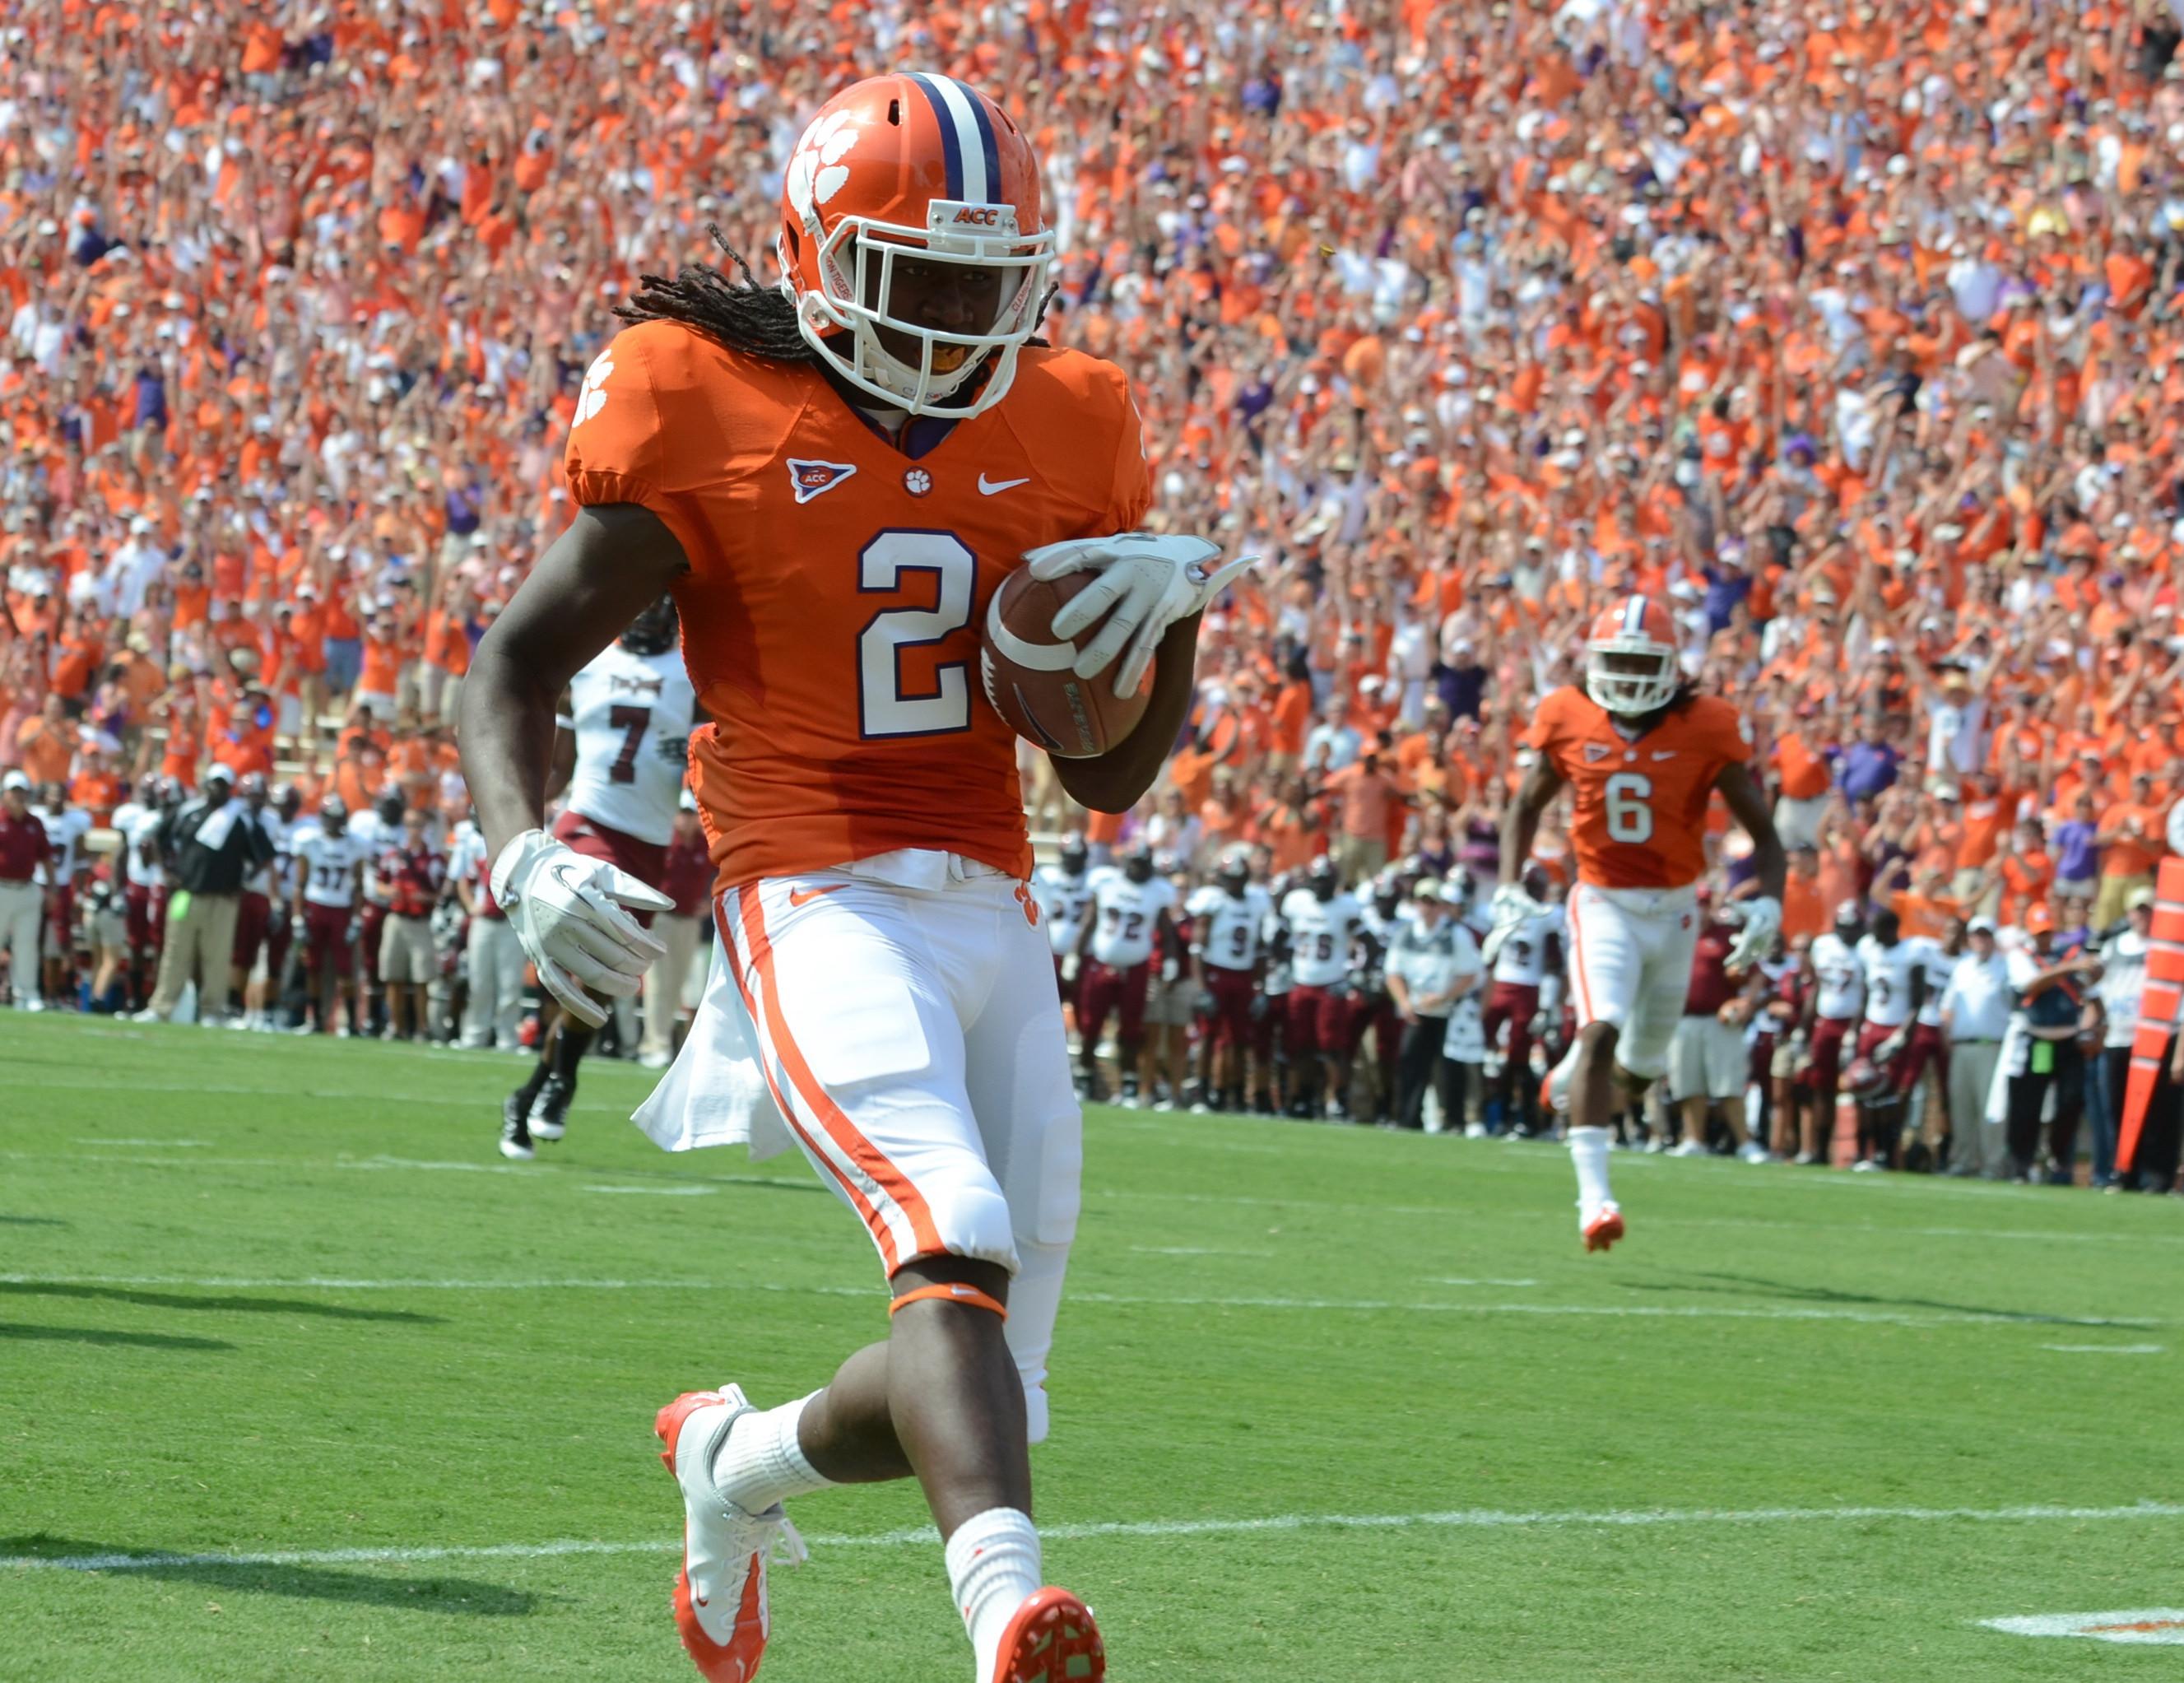 [NCAA] La strada verso il Draft: Sammy Watkins